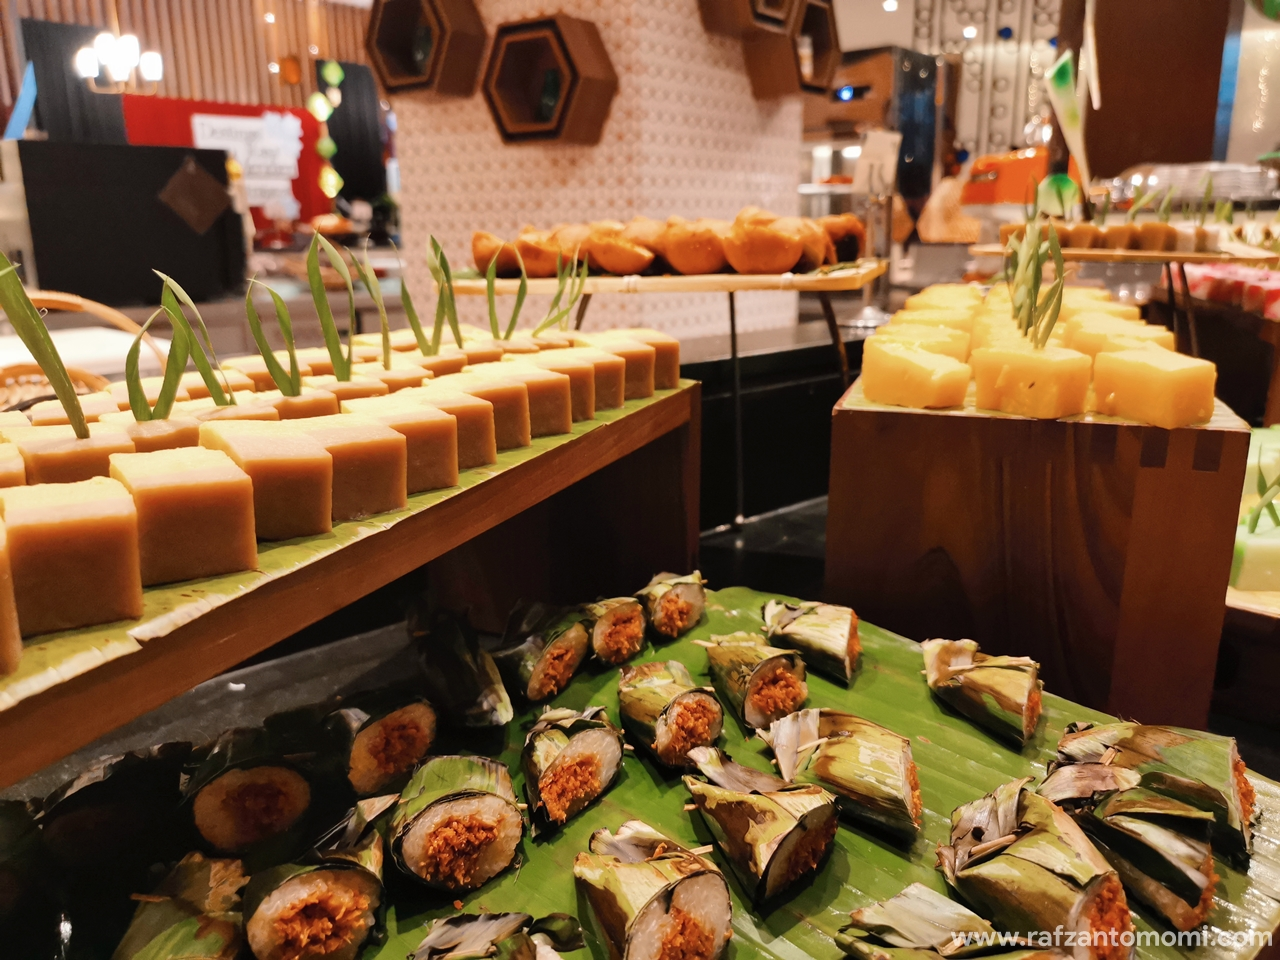 Buffet Ramadan 2020 - Latest Recipe, Le Méridien Putrajaya